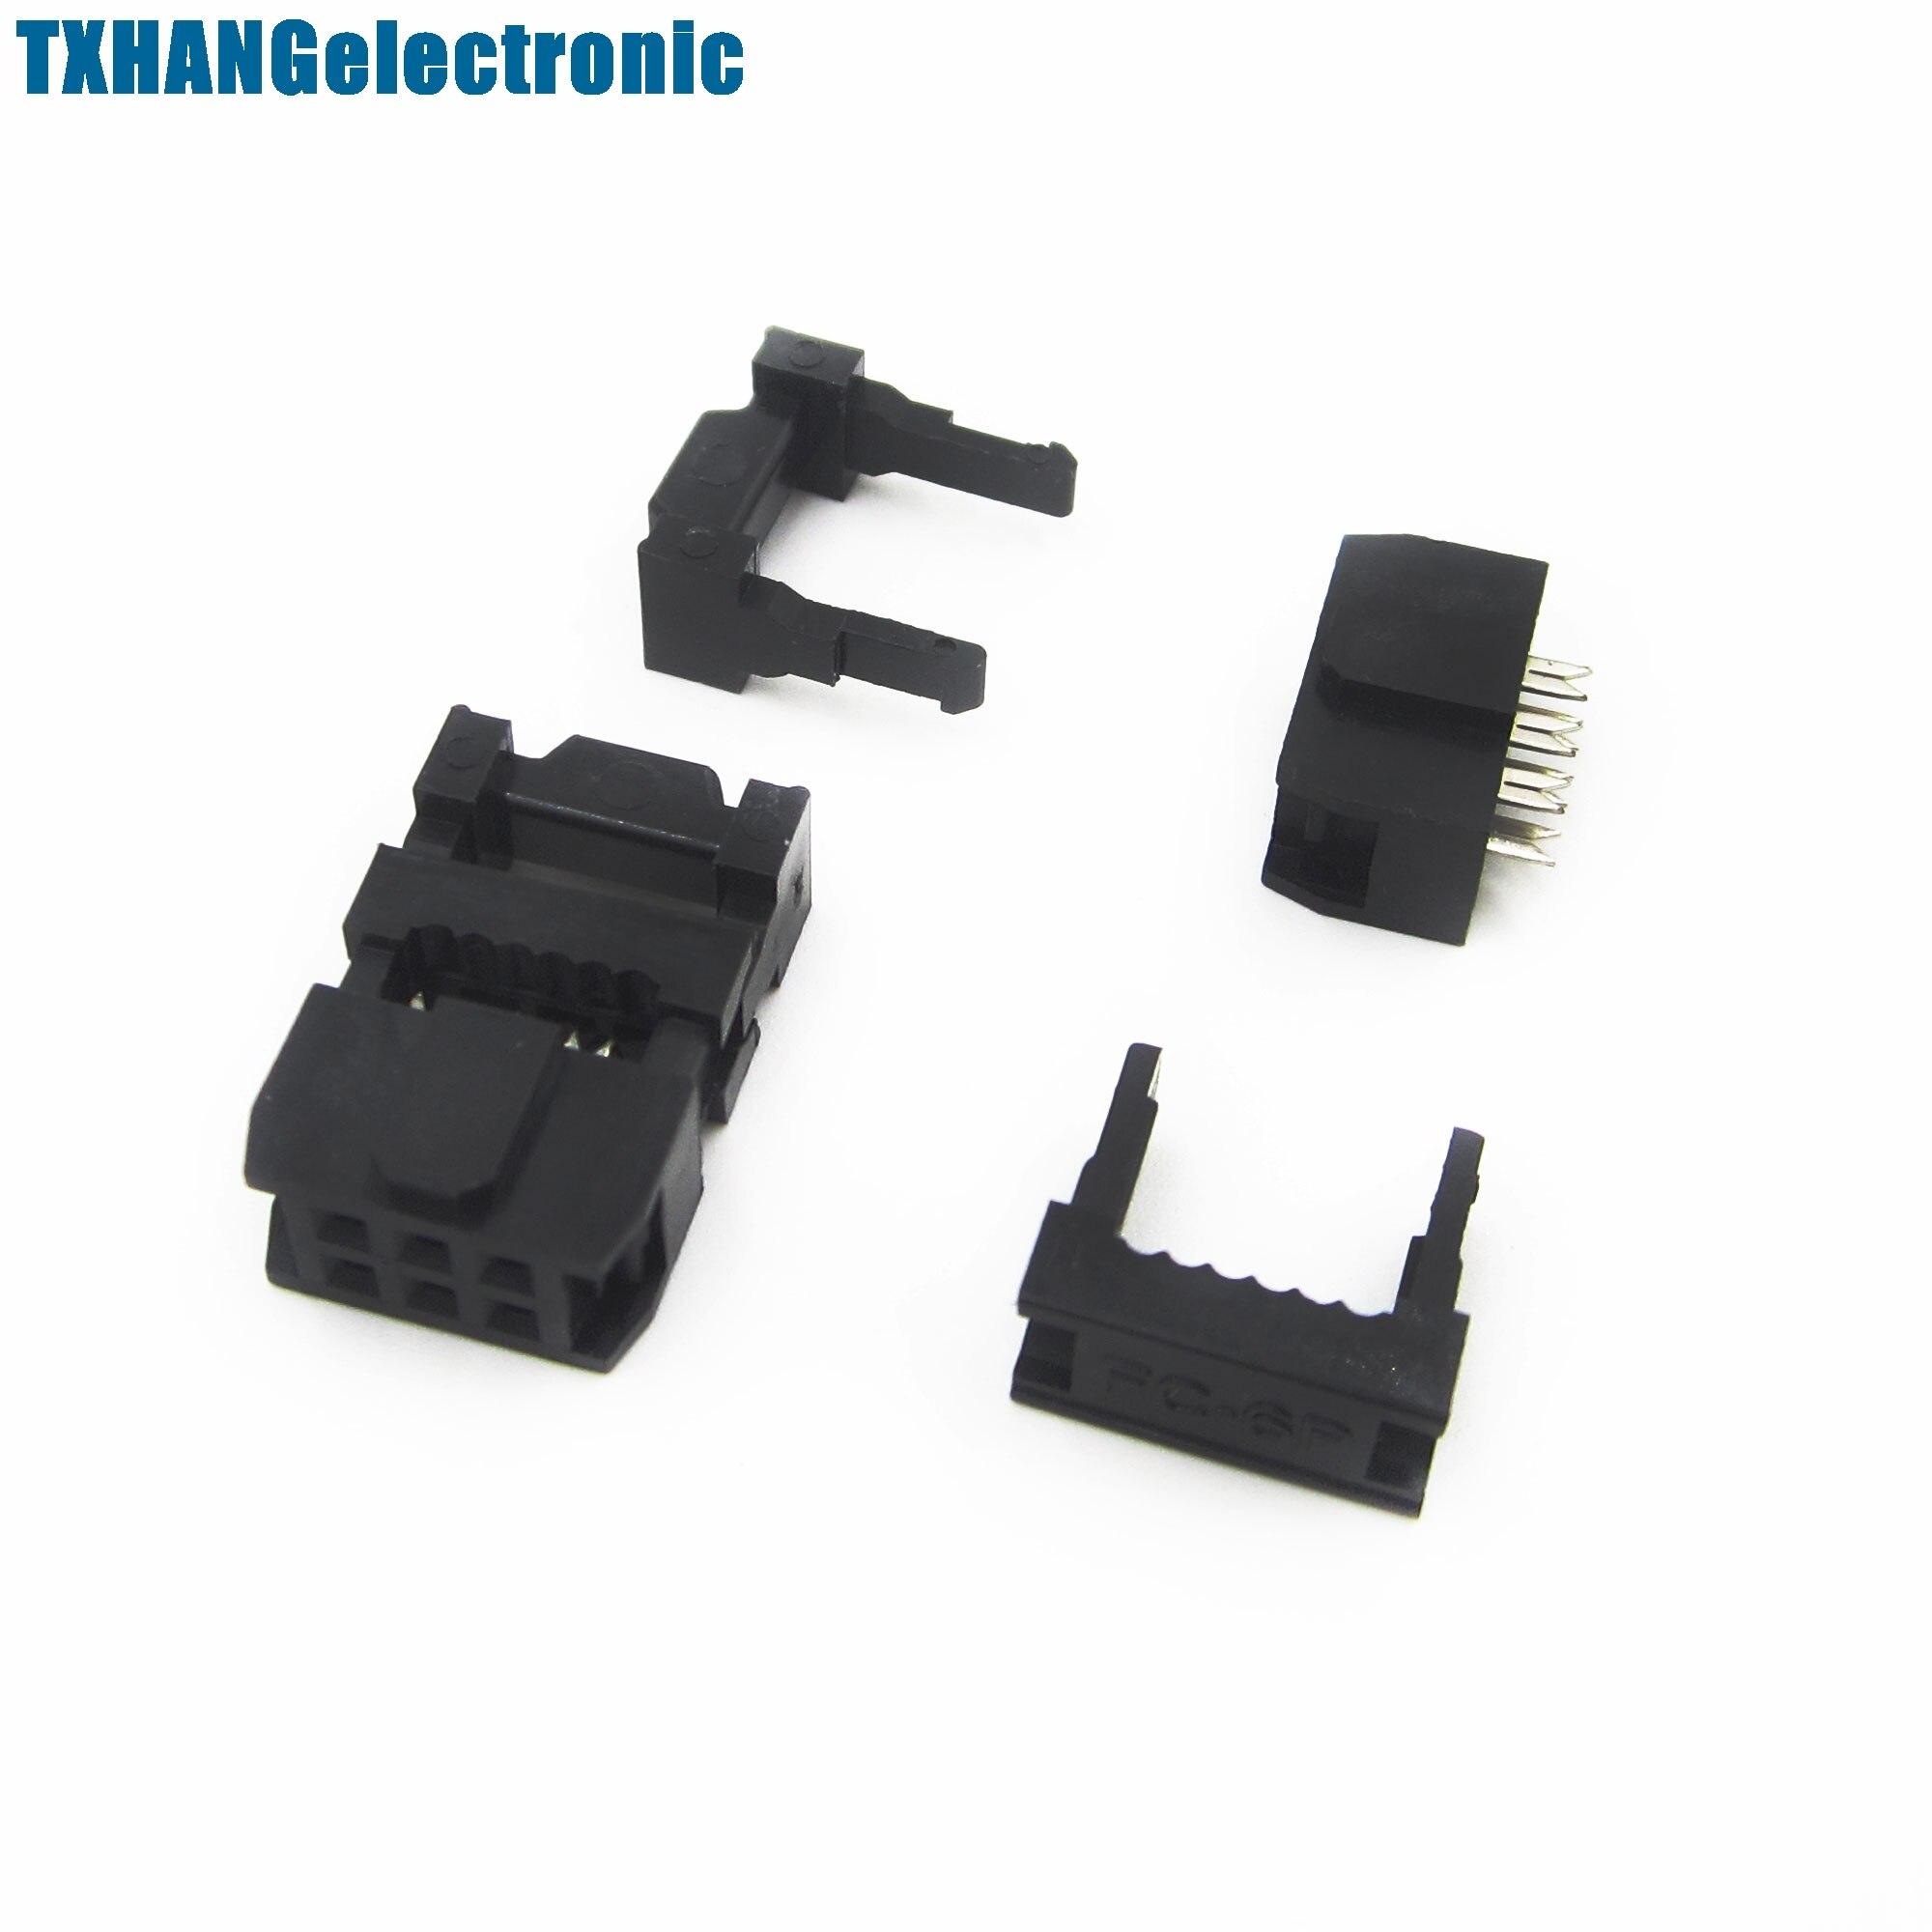 10PCS 2.54mm Pitch 6Pin FC-6P IDC FC Female Header Connector 3pcs//set